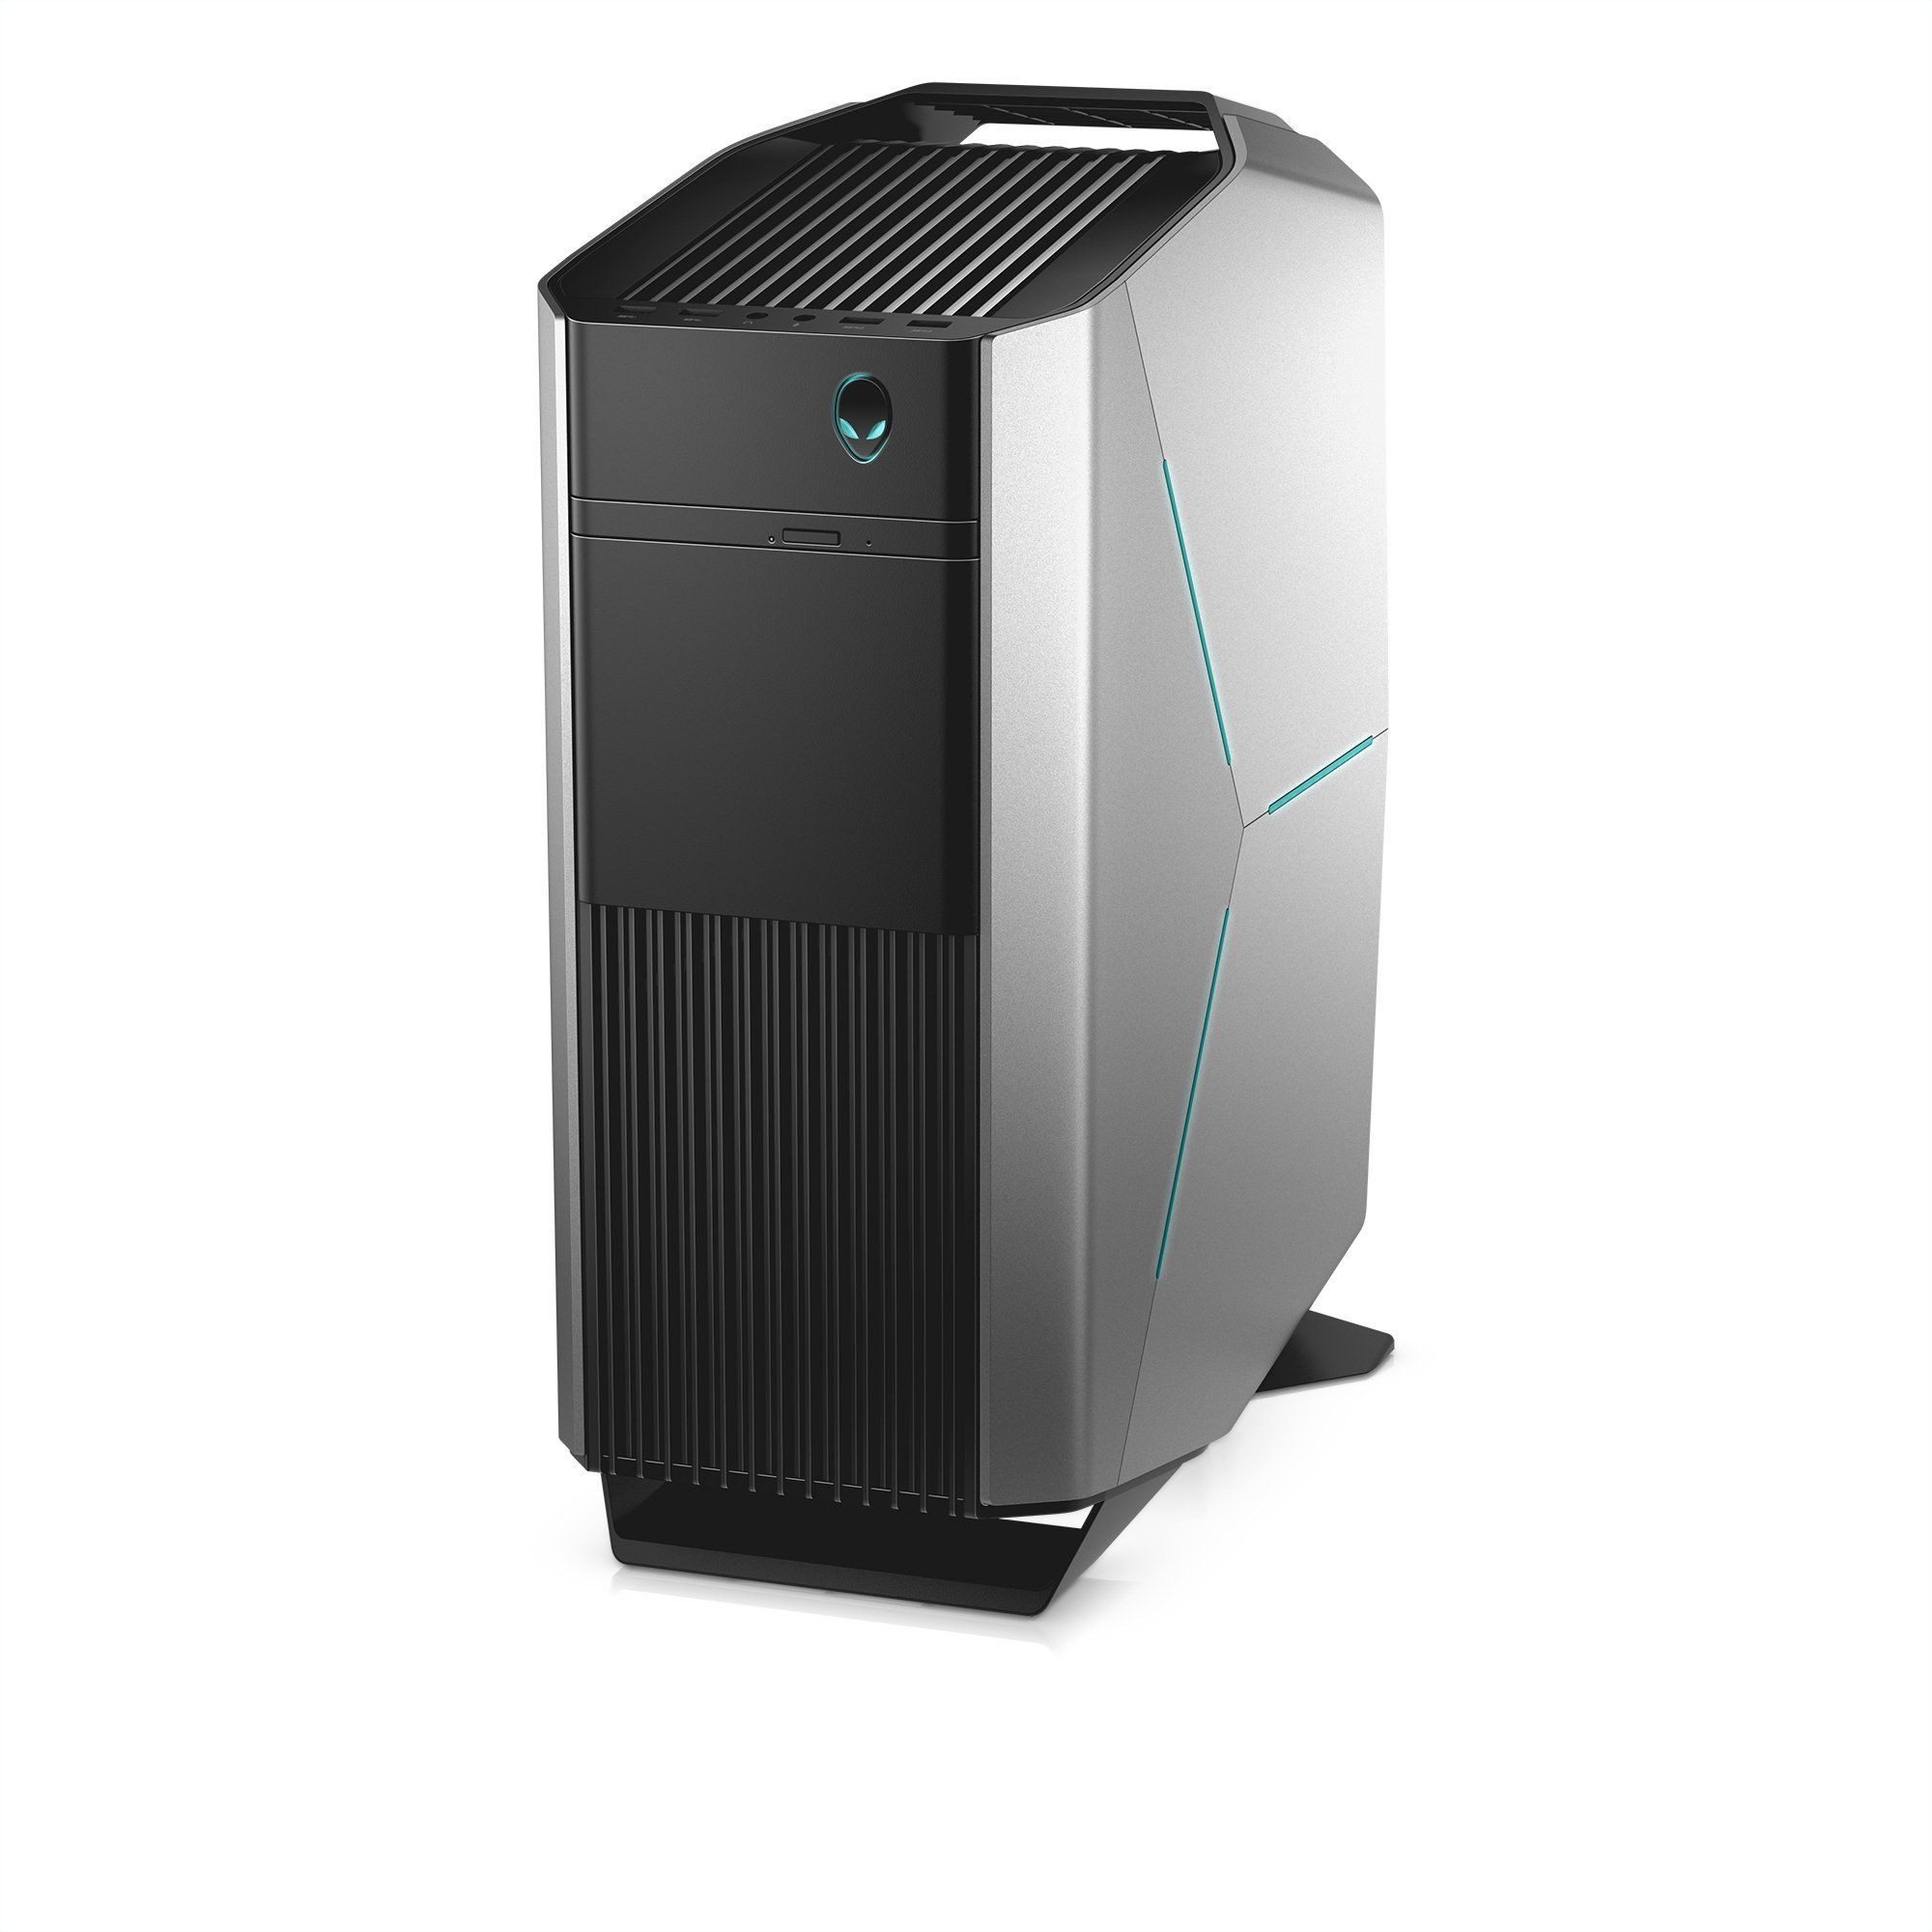 Dell Alienware Aurora Gaming Pc Desktop Liquid Cooled I7 8700k